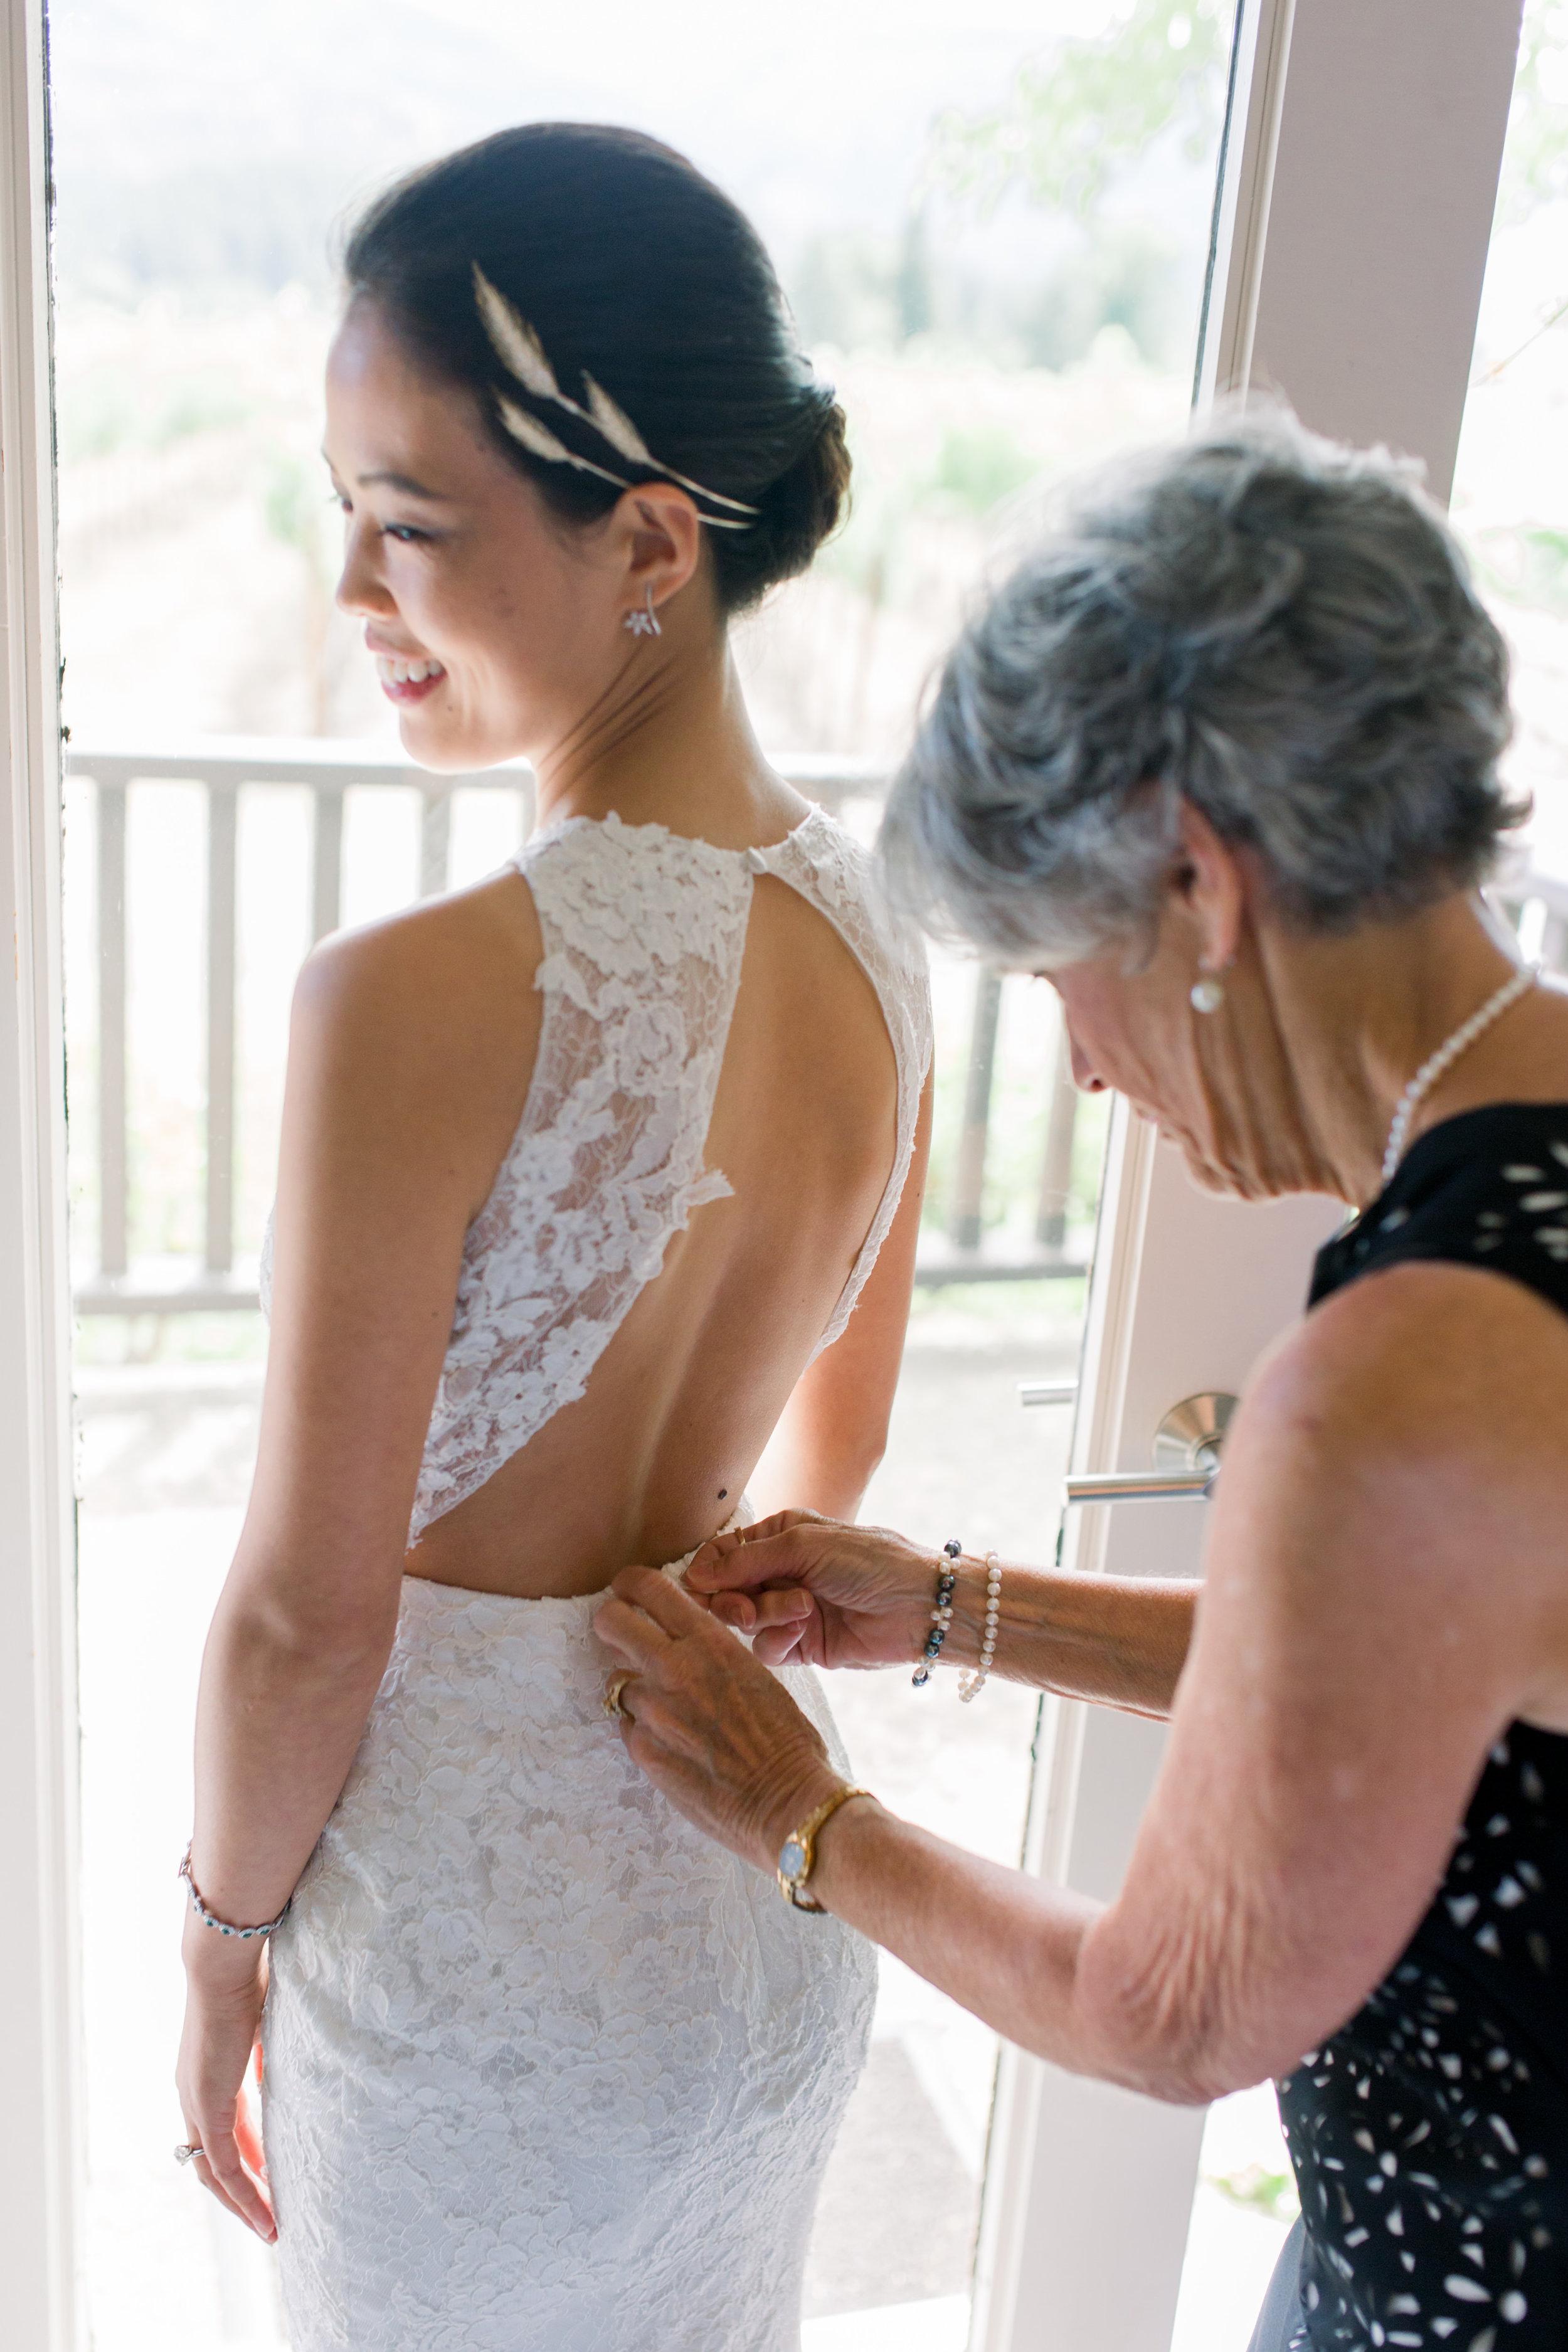 Harvest-inn-wedding-in-napa-california-292.jpg